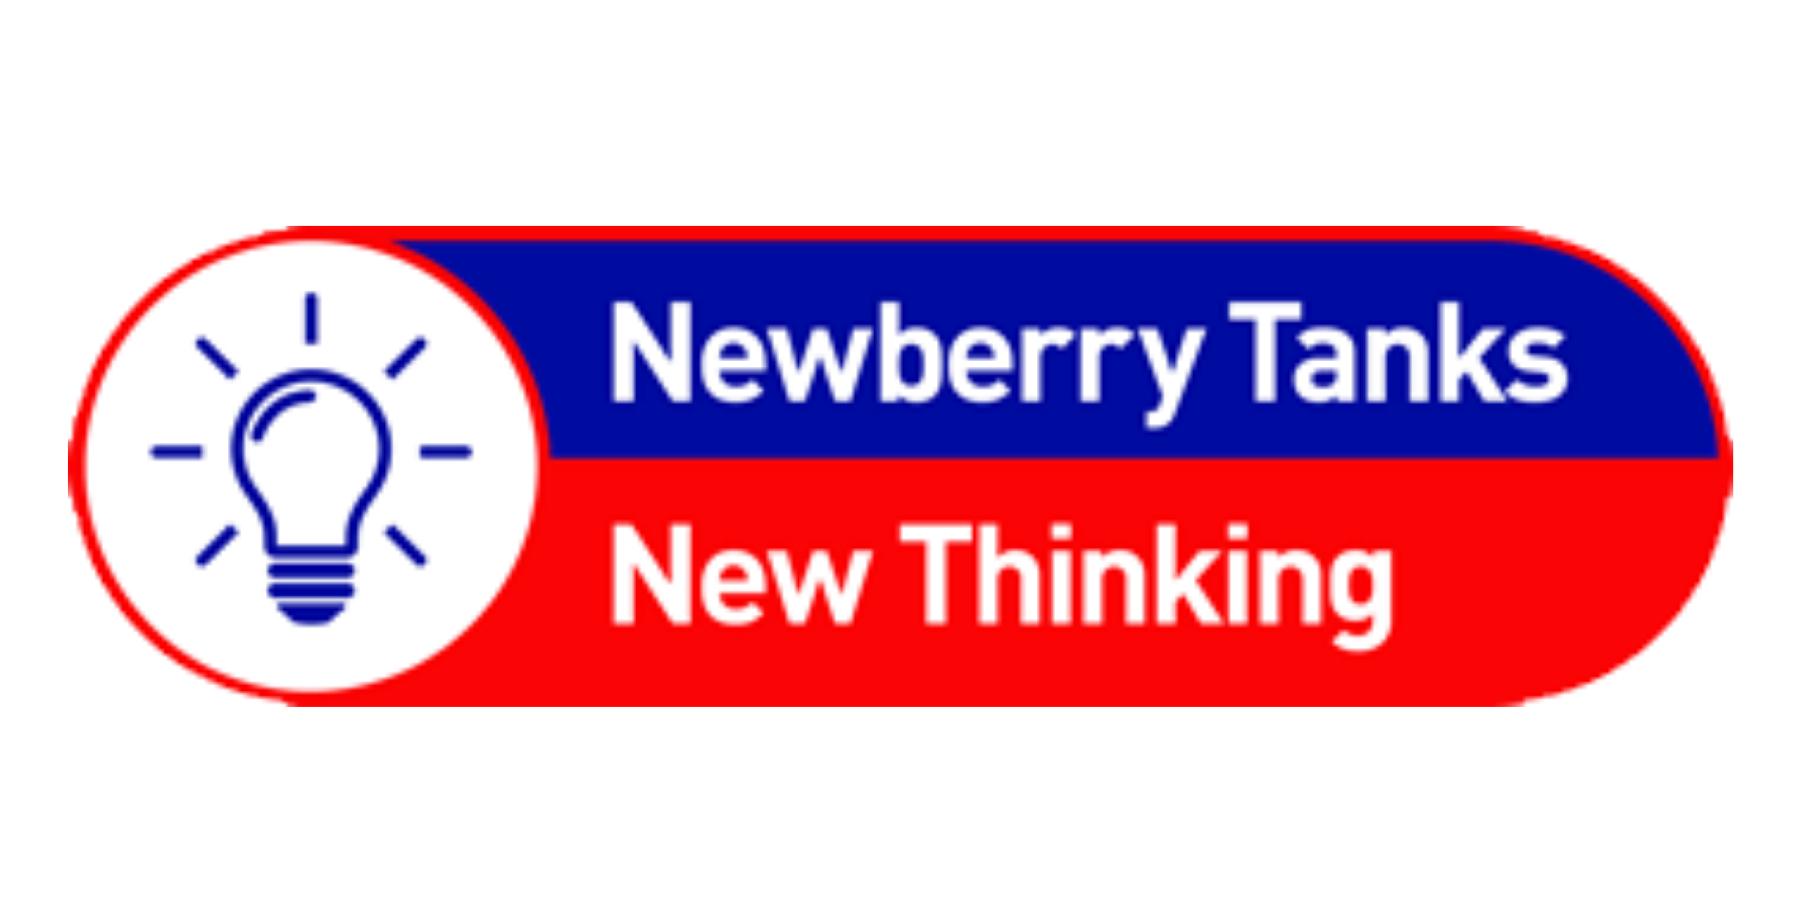 Newberry Tanks